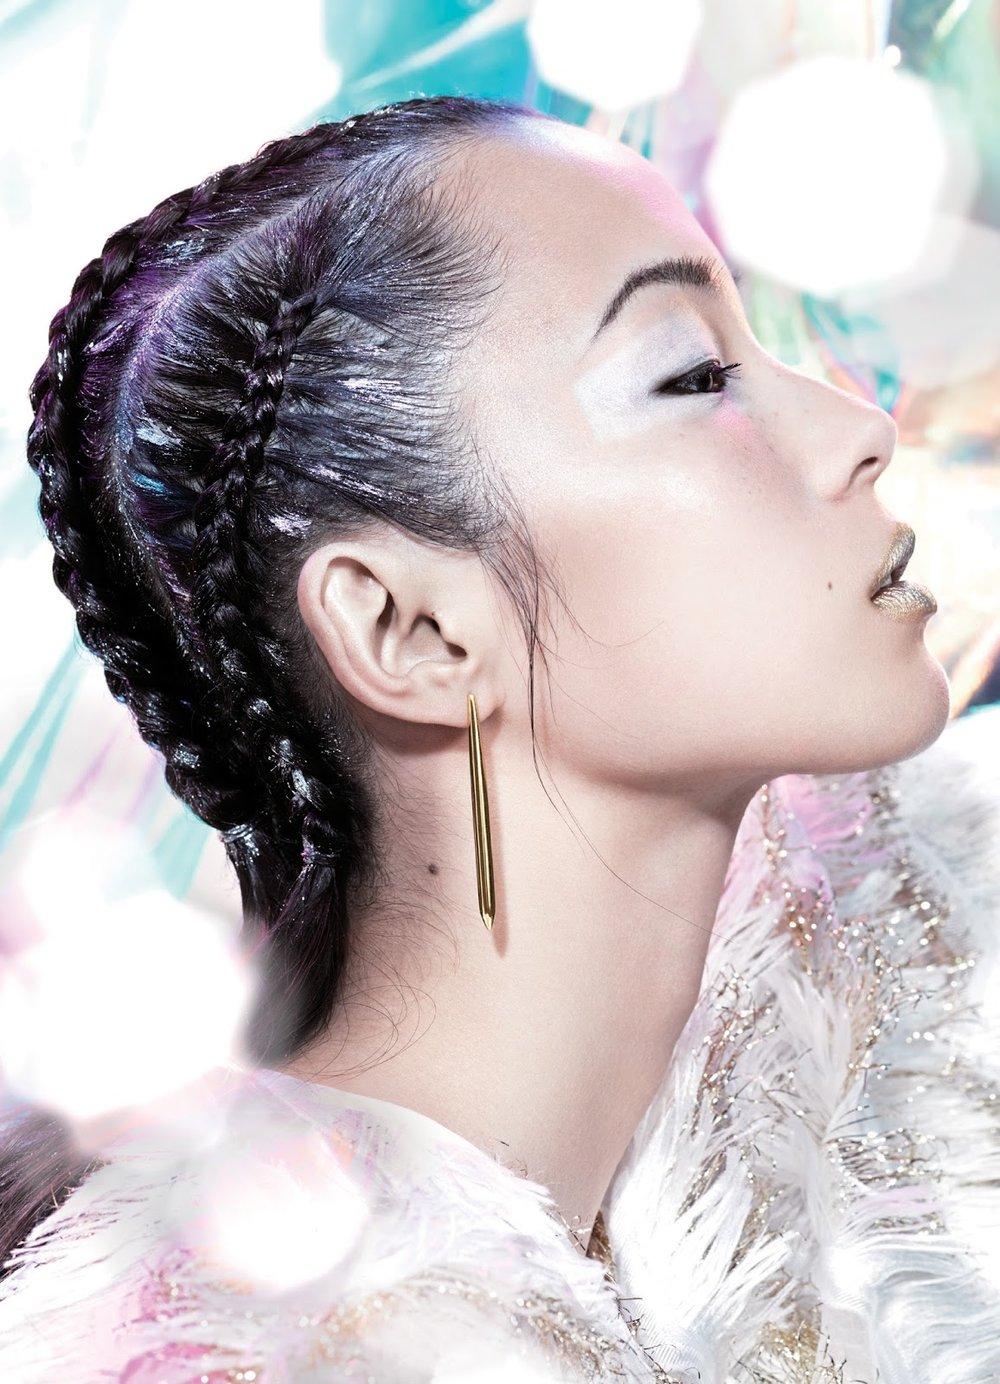 Vogue China Dec-xuai-wen-ju-kenneth-willardt- (2).jpg